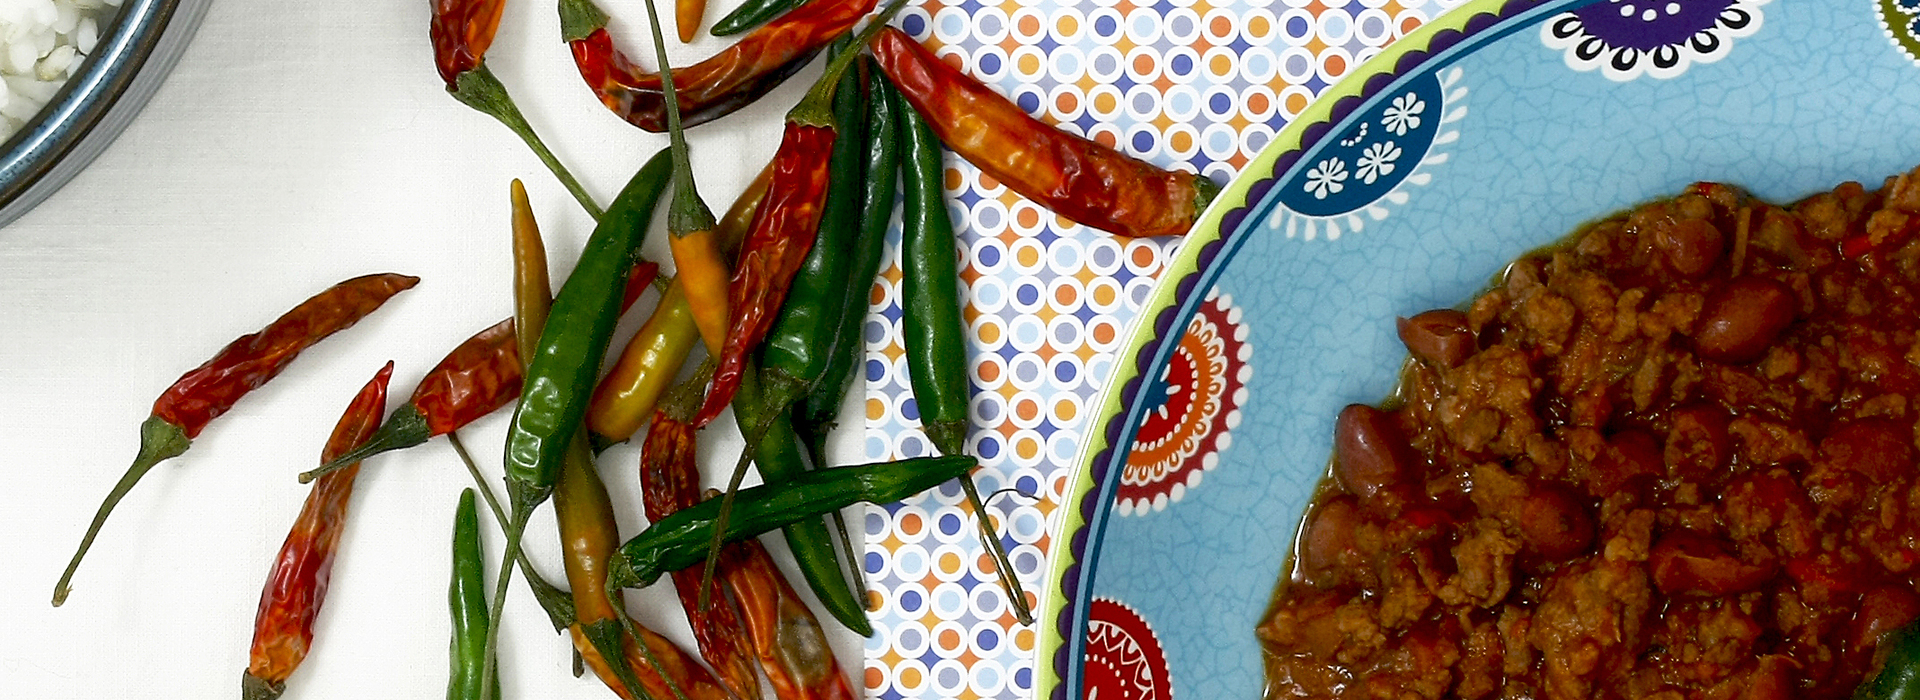 Iniciación a la cocina con Slow Cooker (Segunda Edición)